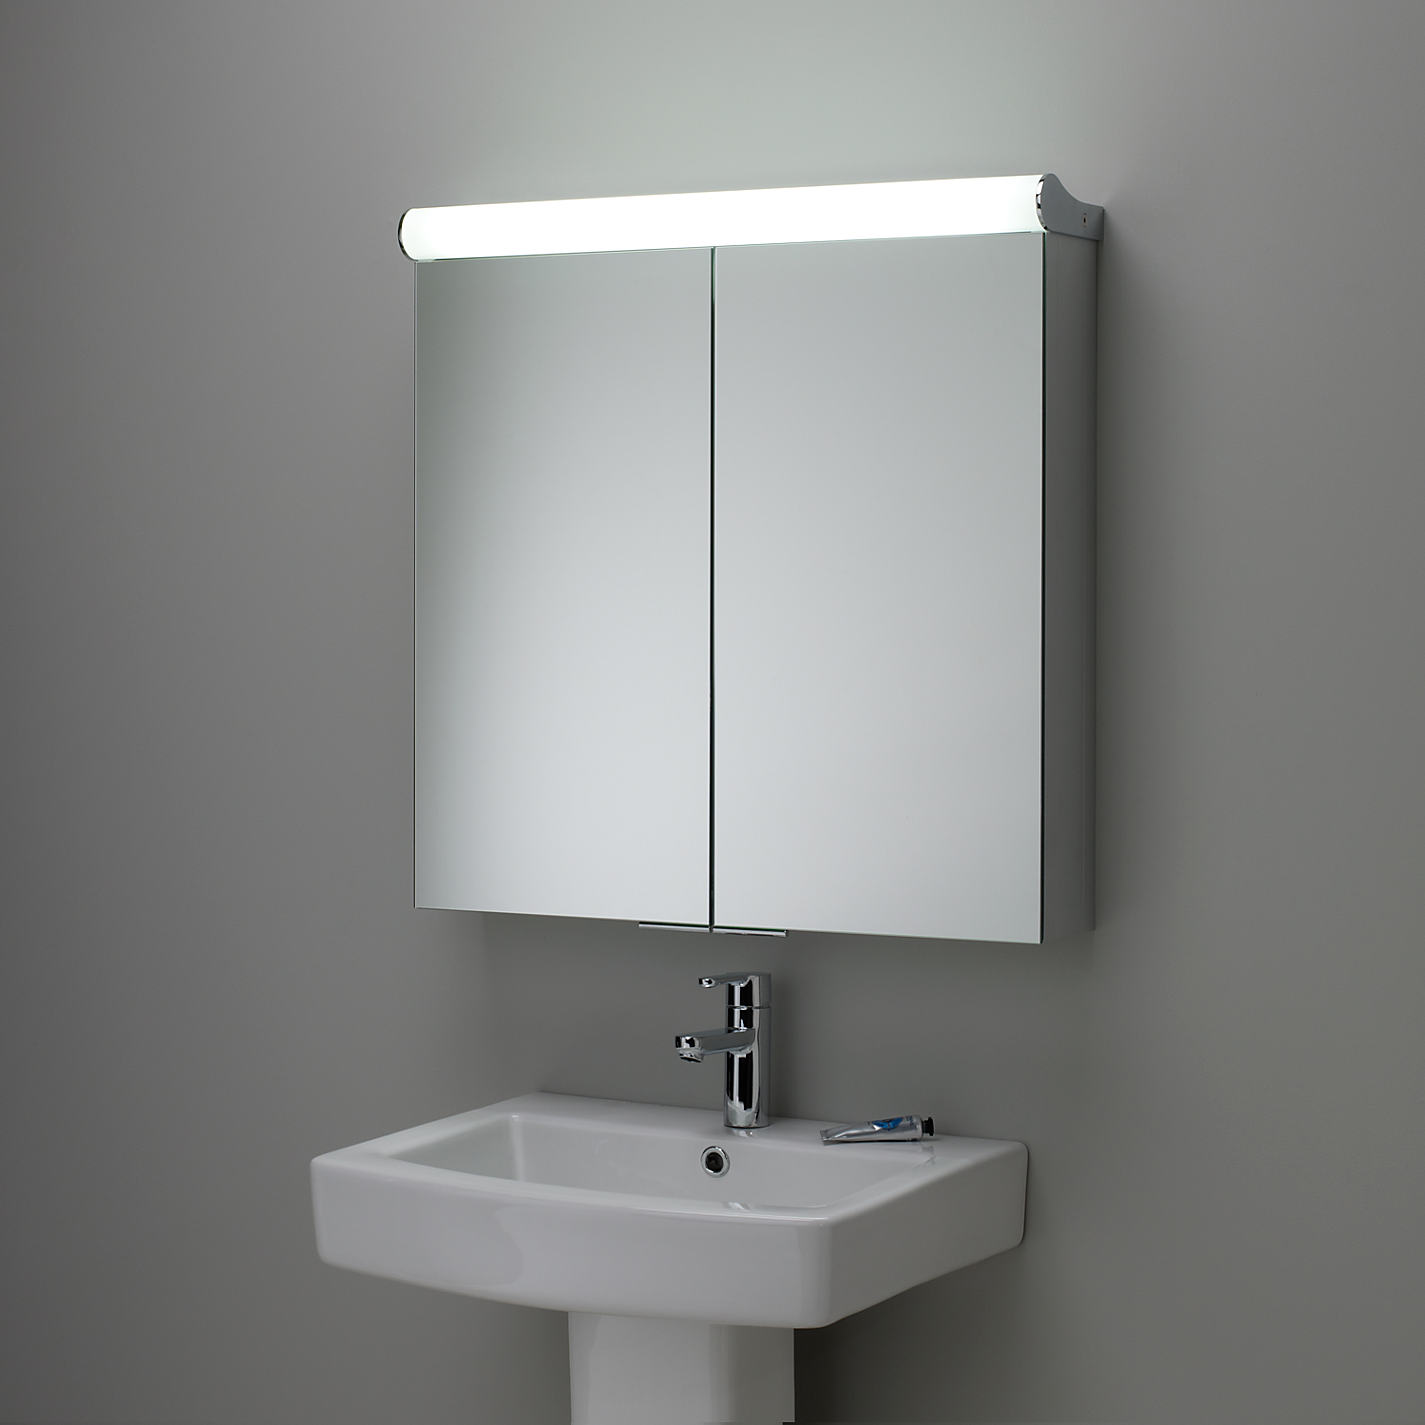 1 x boxed latitude illuminated bathroom cabinet please for Mirror please